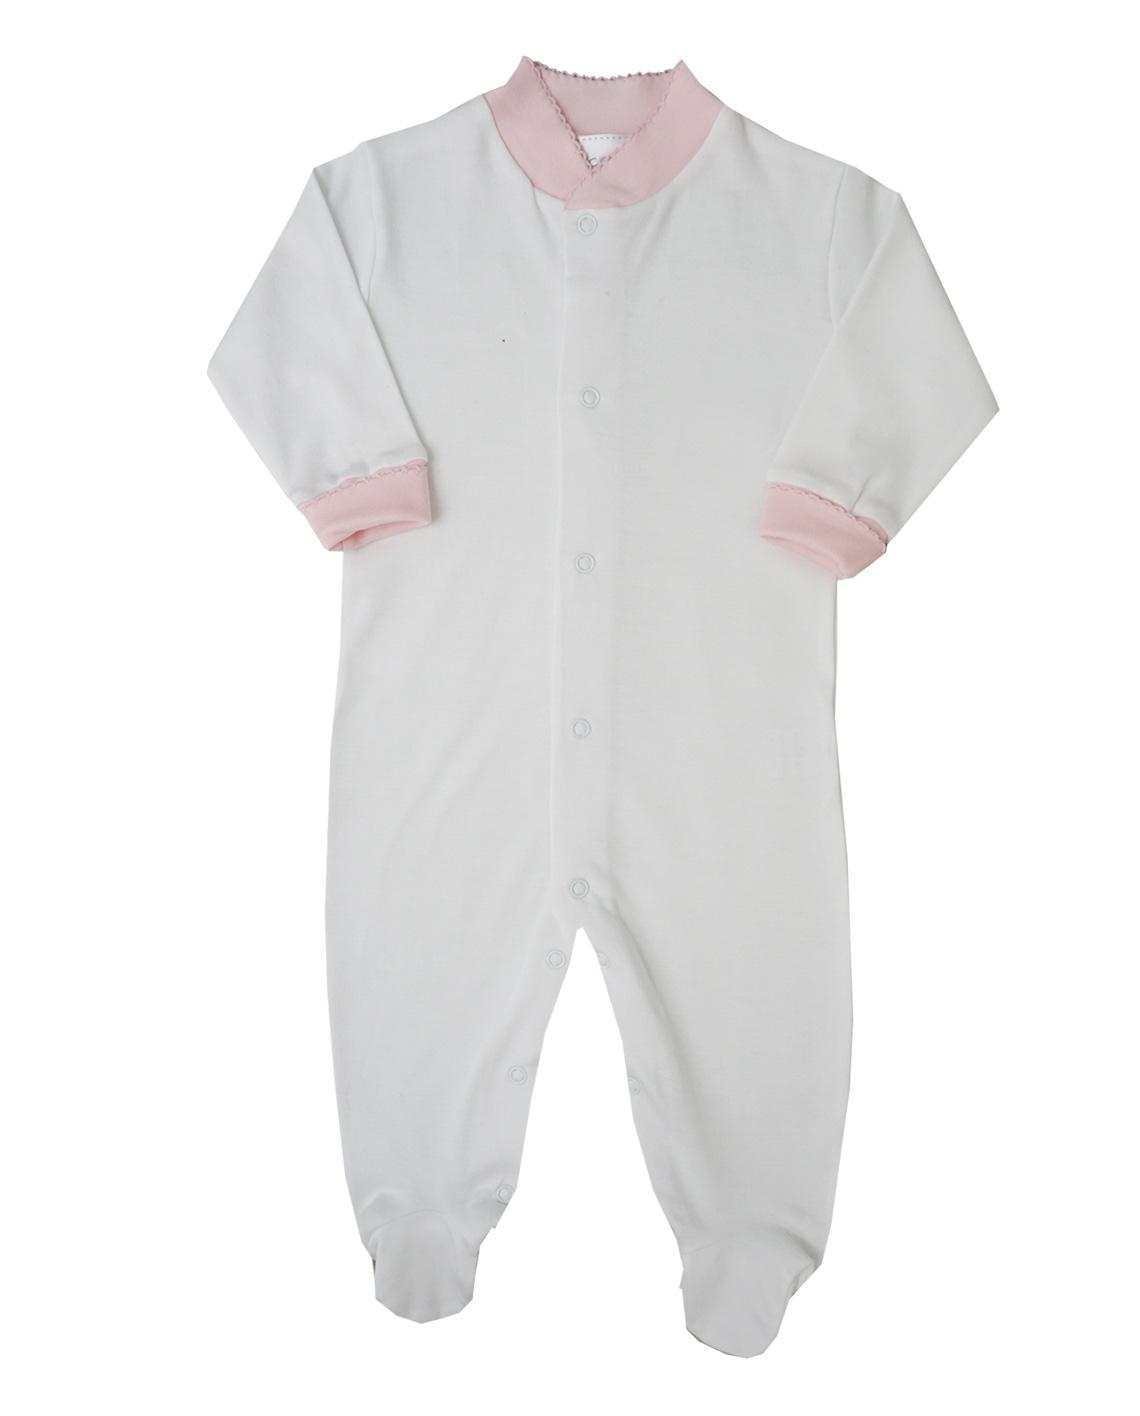 Pima Cotton Footie Basic Solid White, Color Cuffs ECCH – Pima Cotton ...